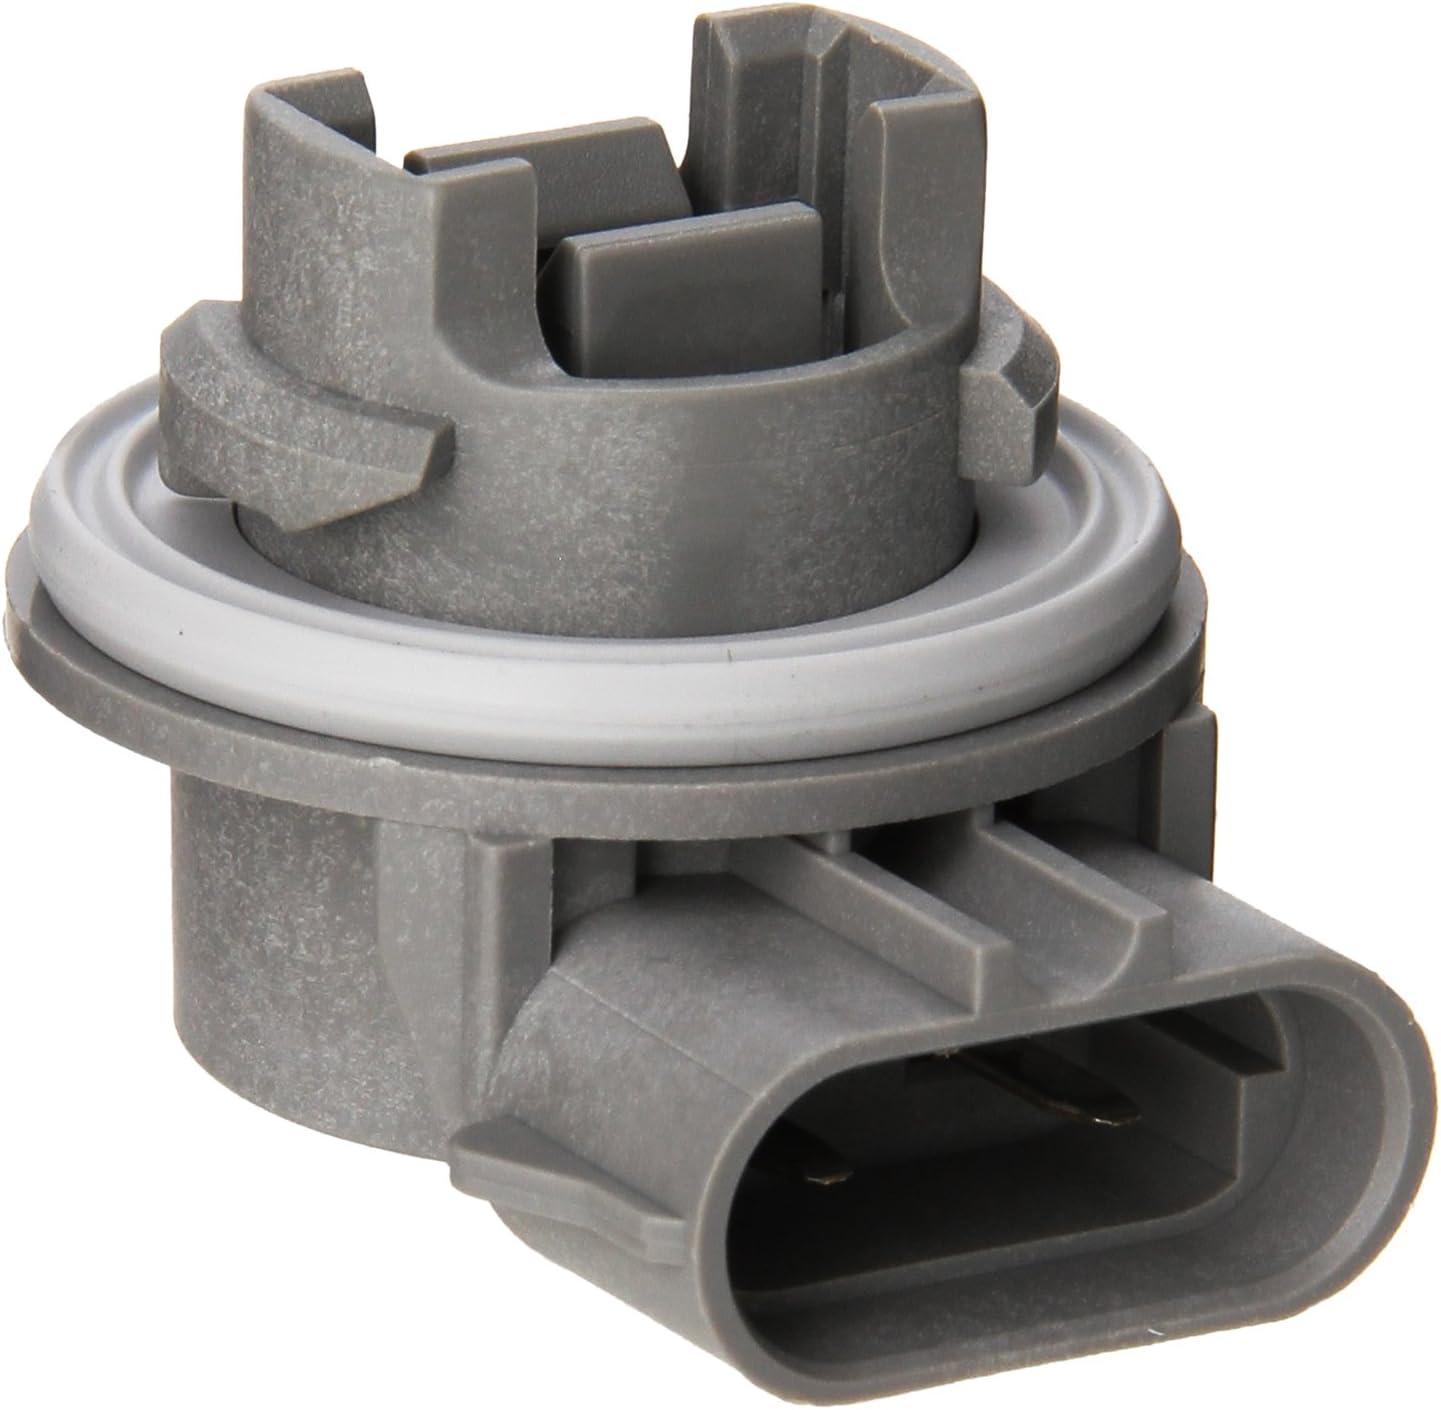 Genuine Ford F1TZ-13411-G Socket Assembly